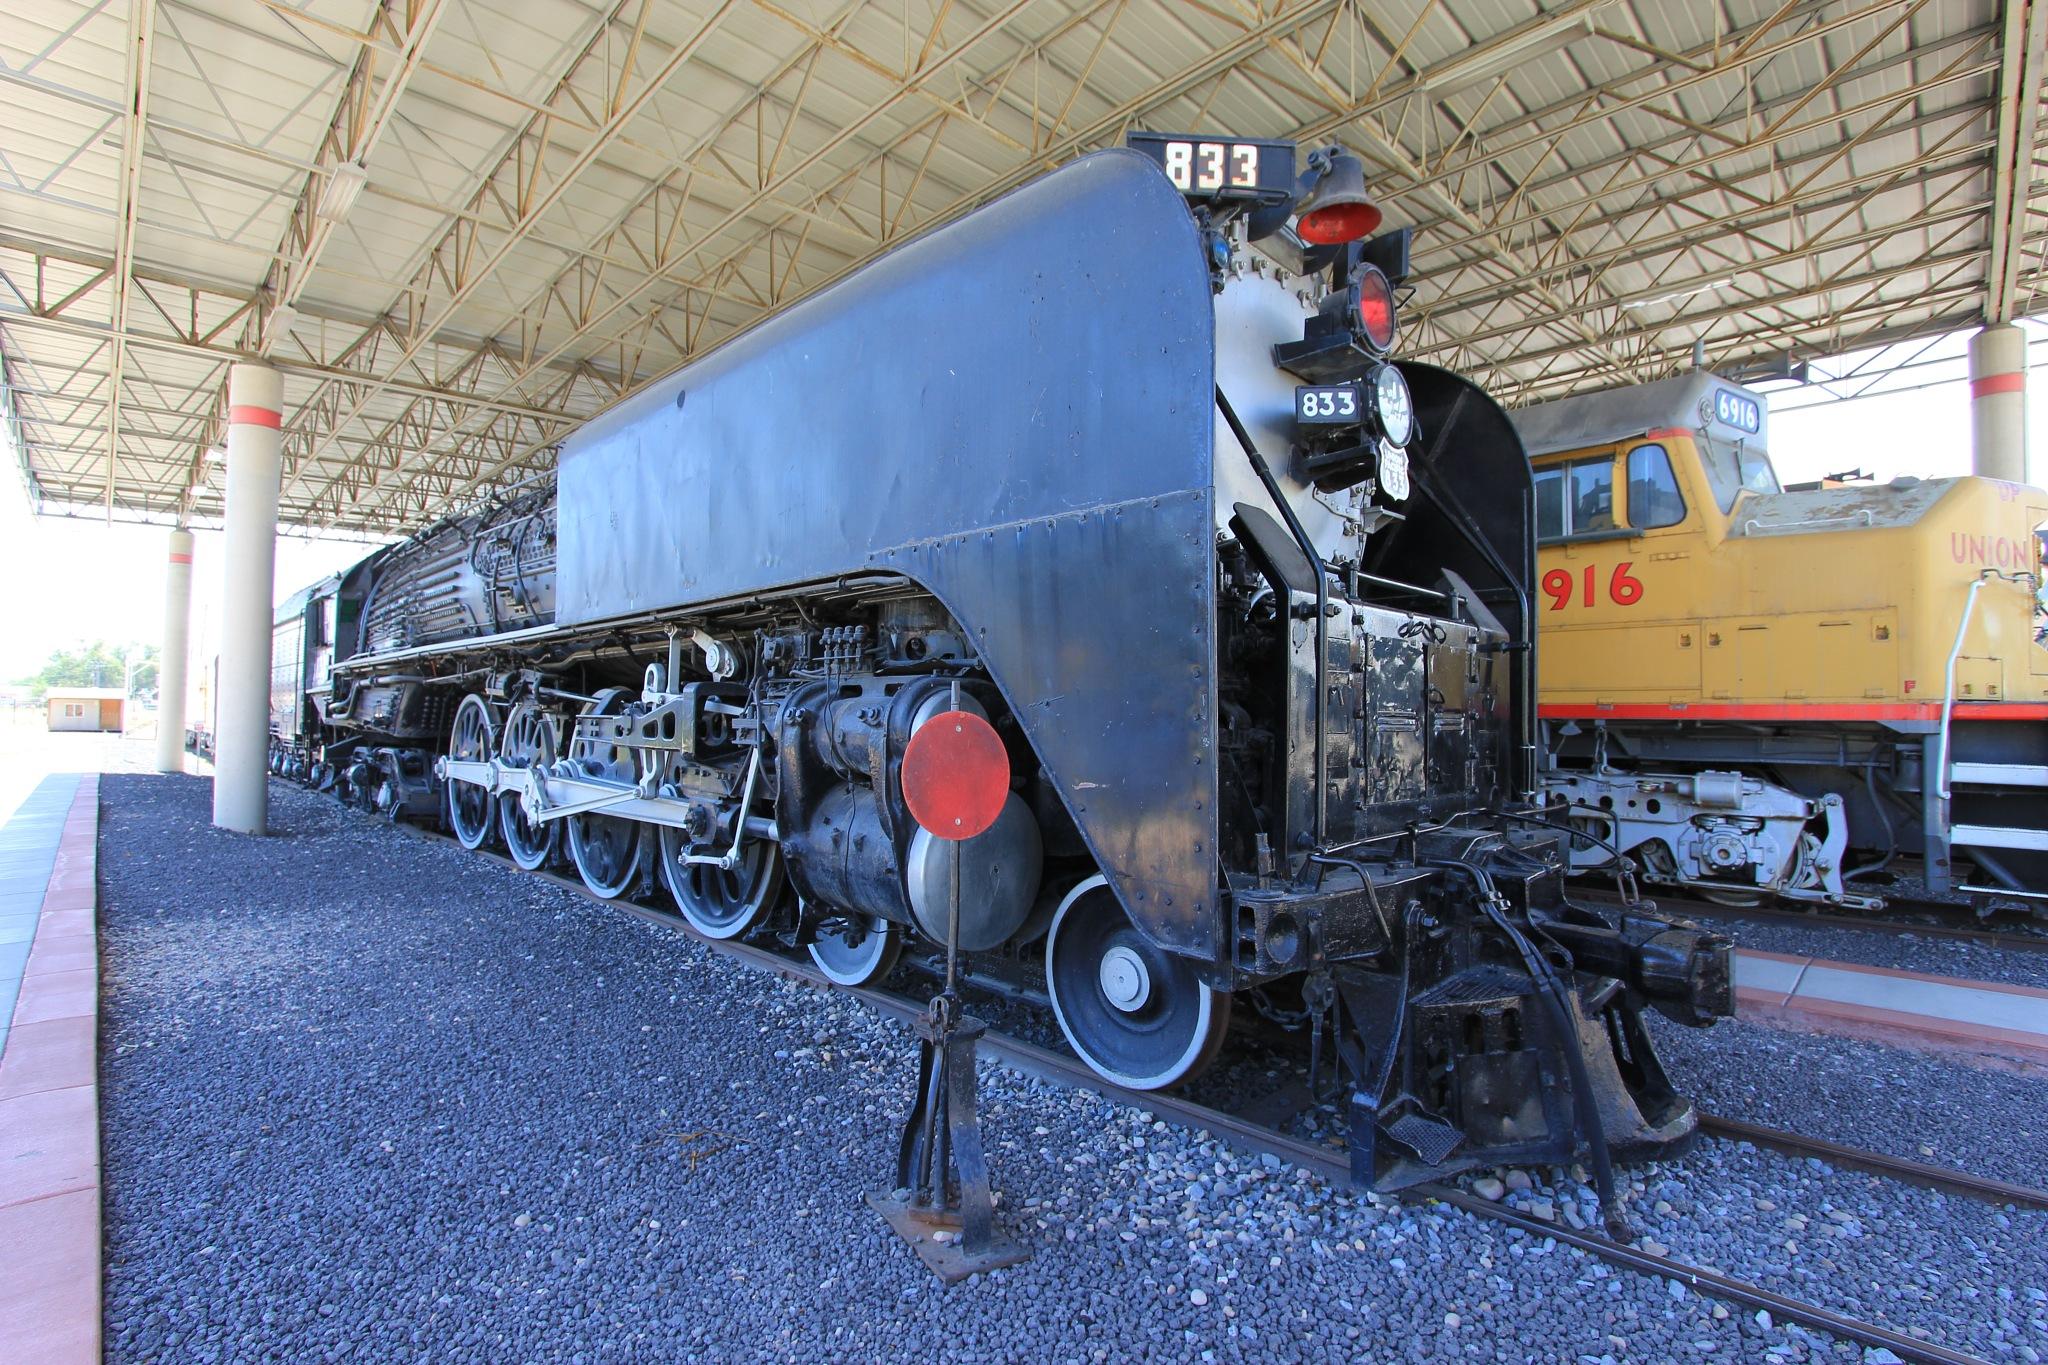 Union Pacific 833 by richard.klaus.900